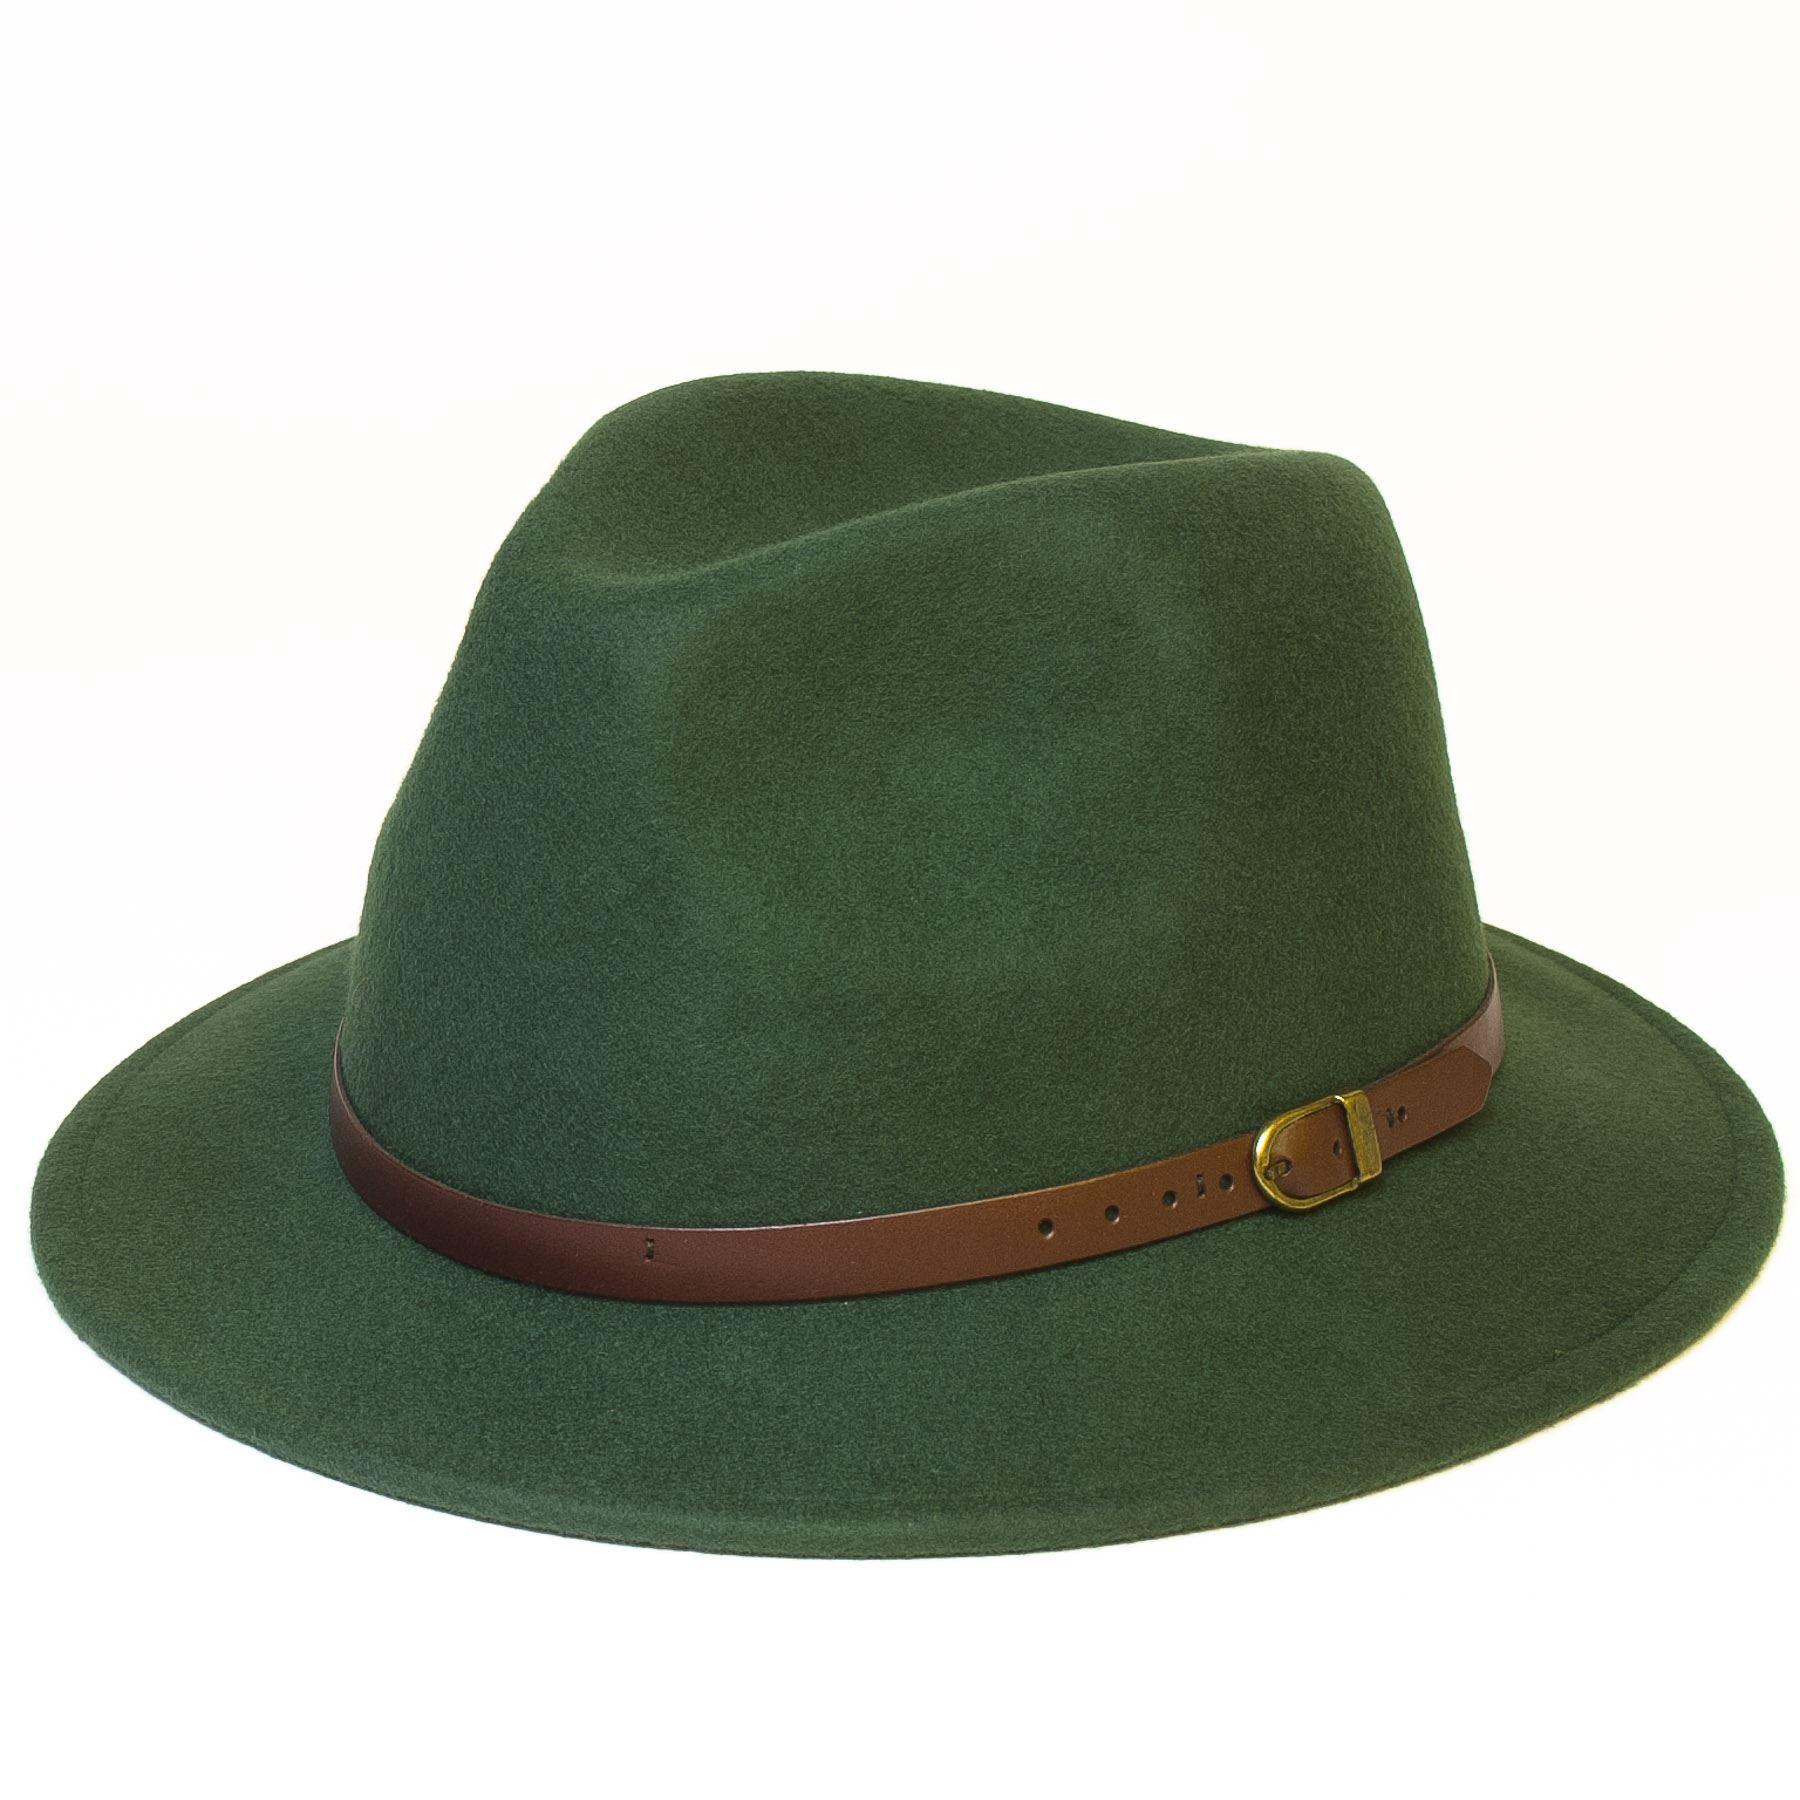 Mens Women Wool Hand Made Felt Fedora Wide Brim Panama Style Hat Cap New